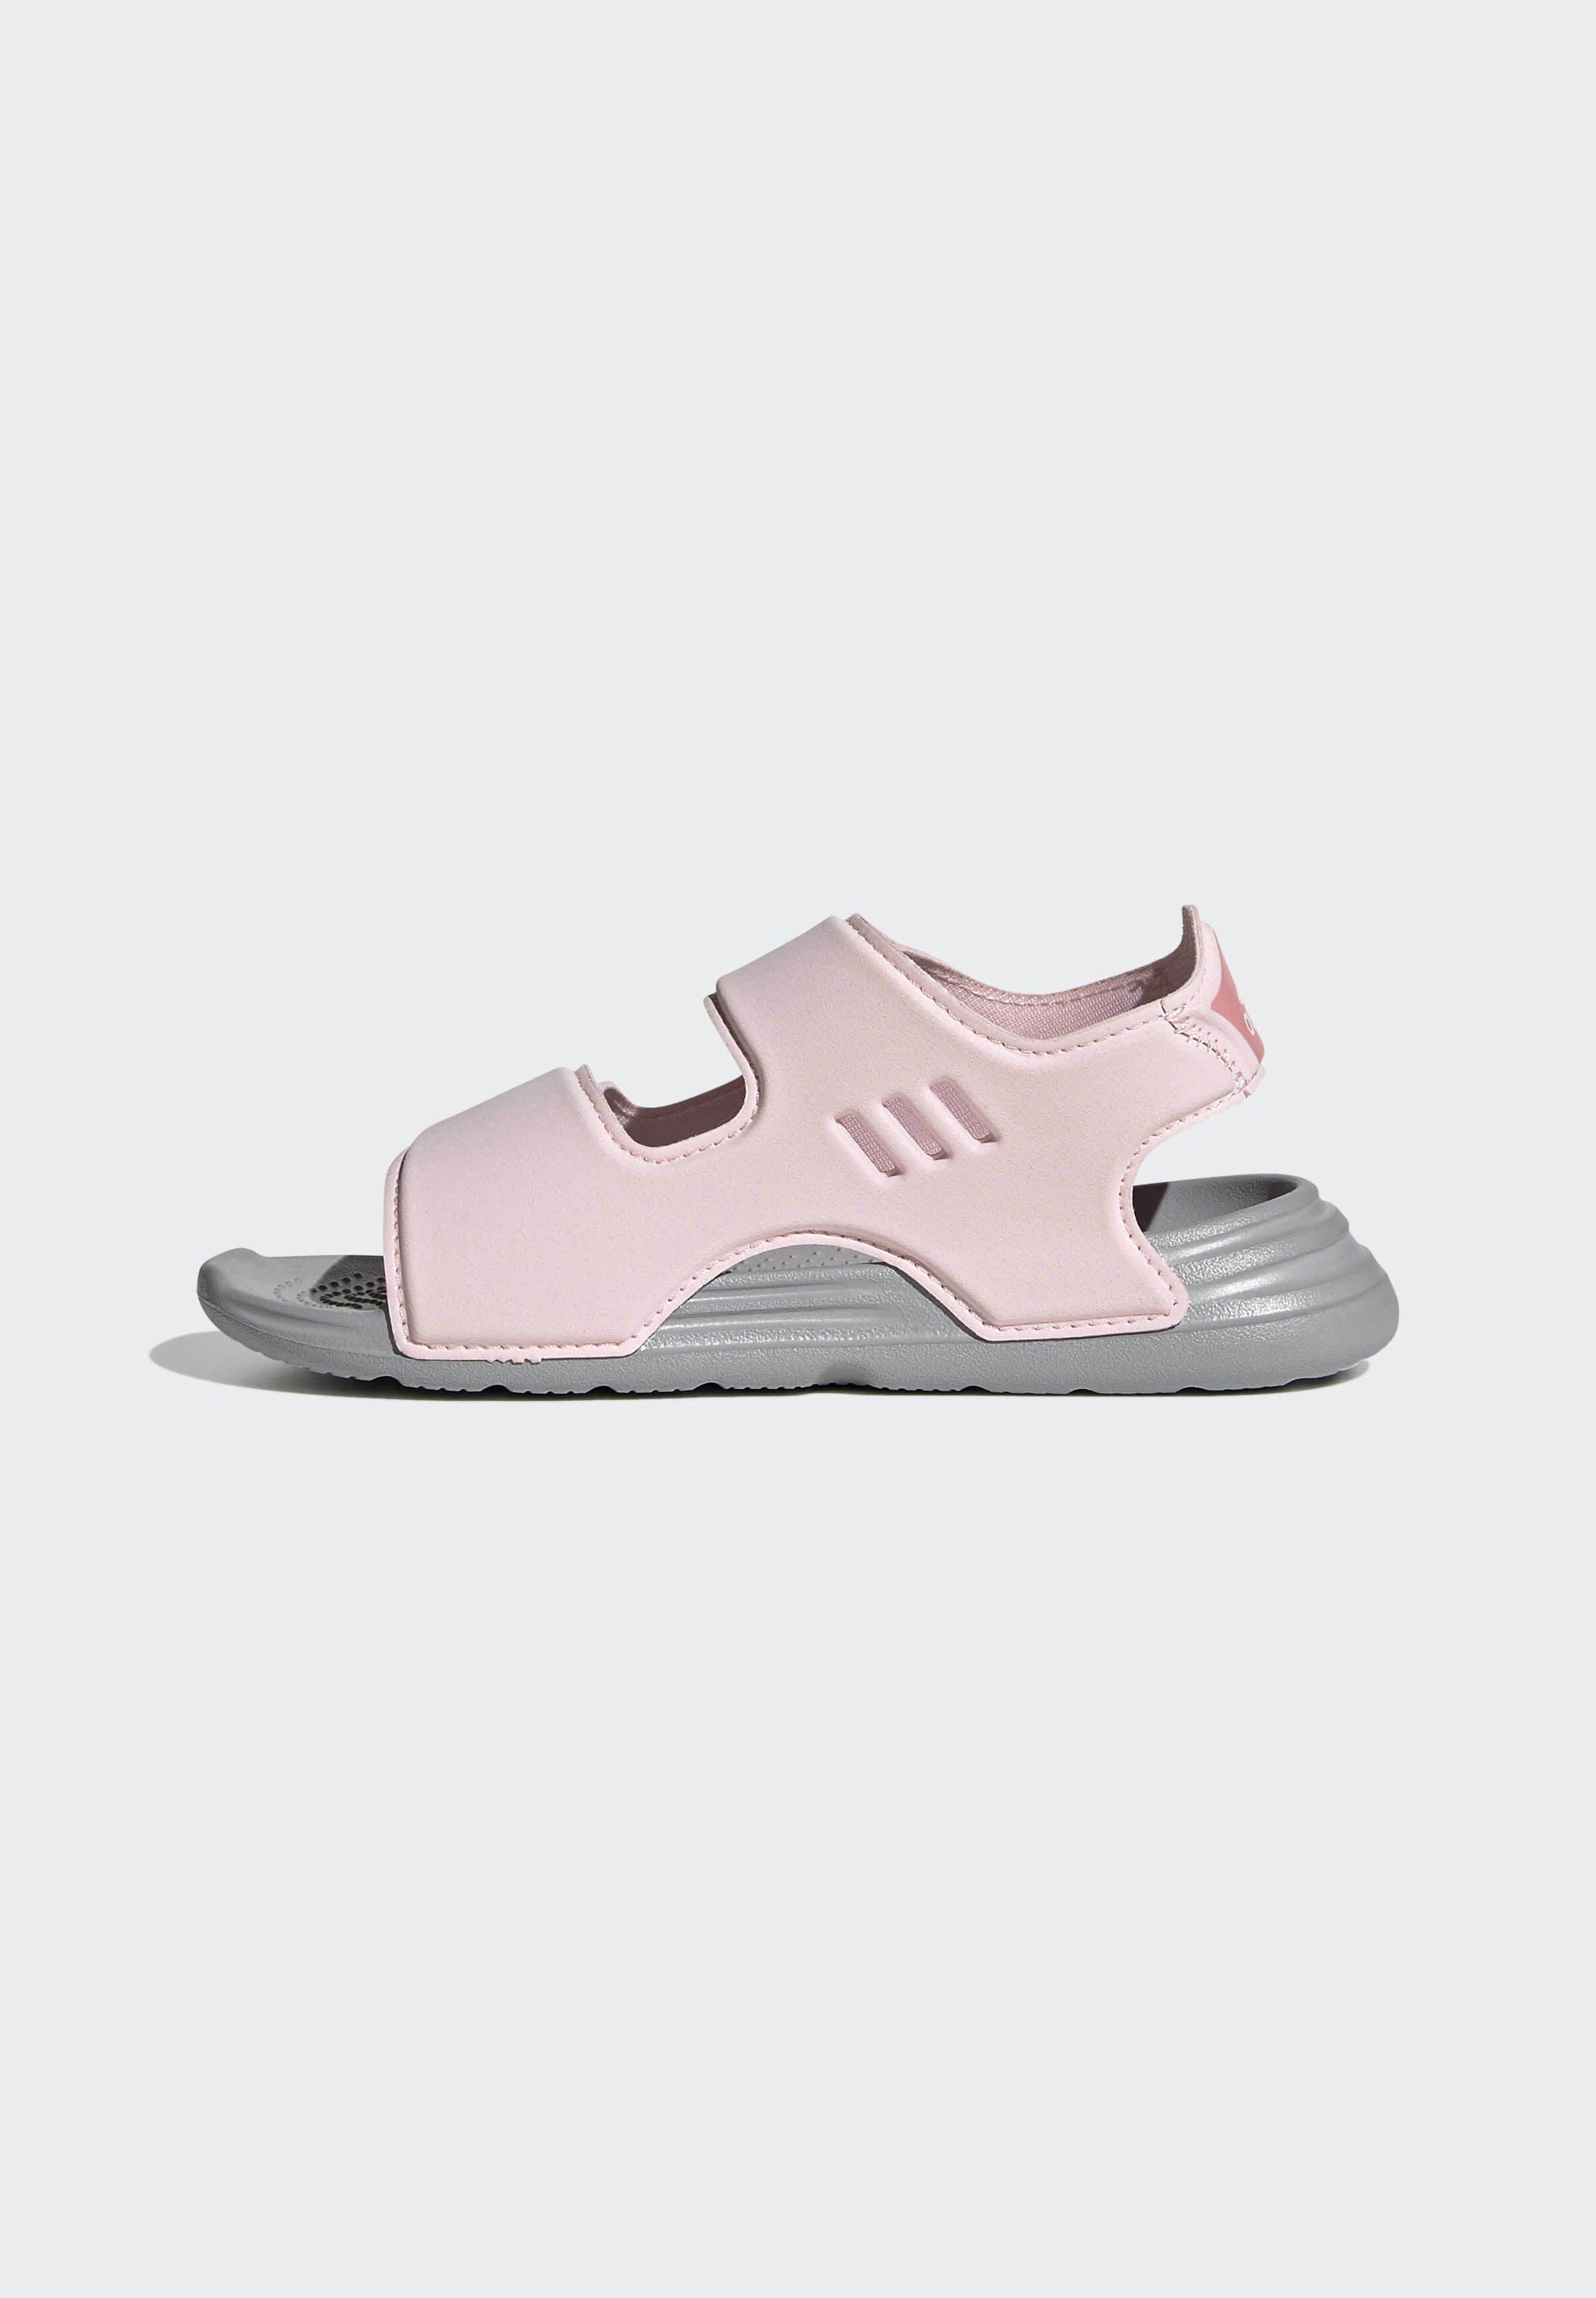 Kids Pool shoes